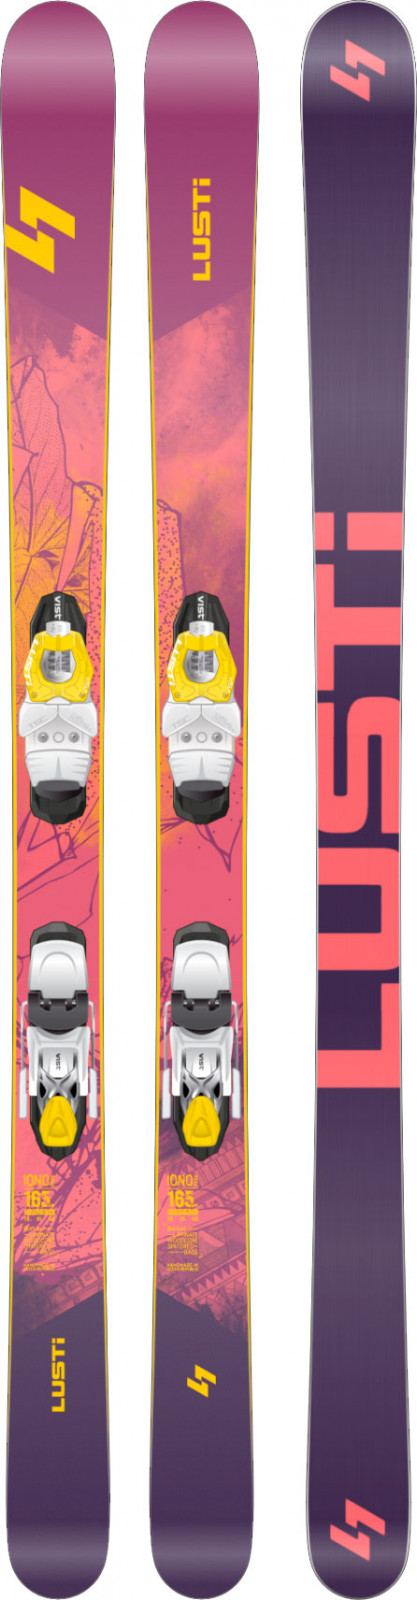 Lusti Iono + VIST VSP 310 + deska SPEEDSPACER